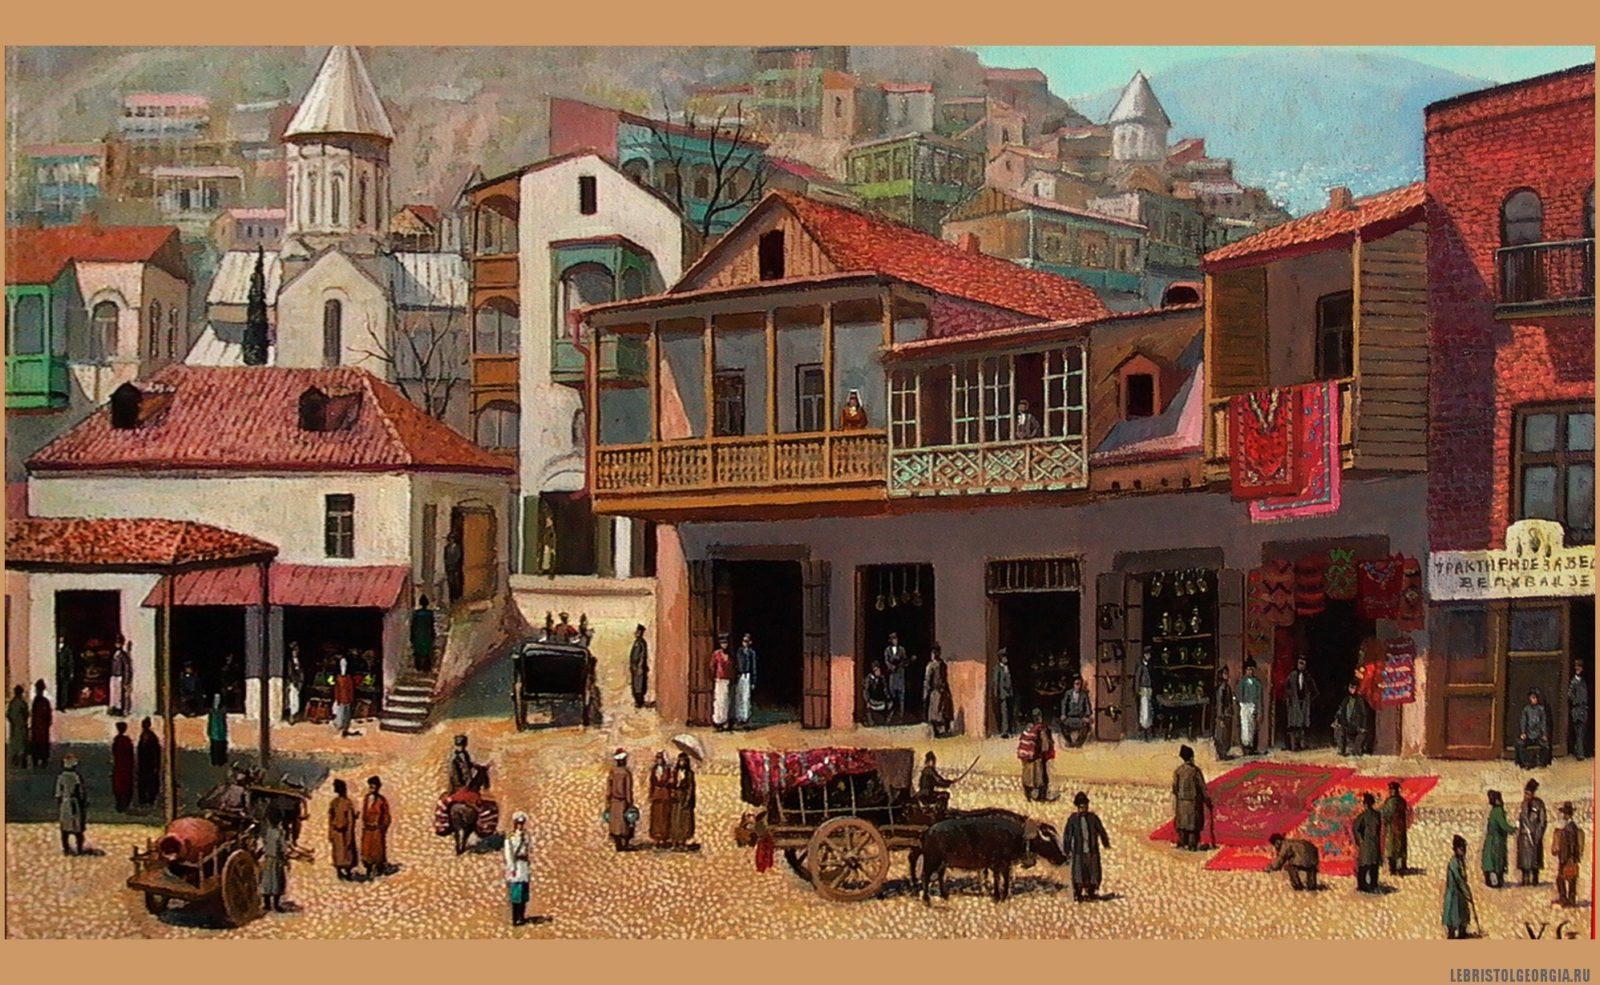 Шайтан базар. Джованни Вепхвадзе